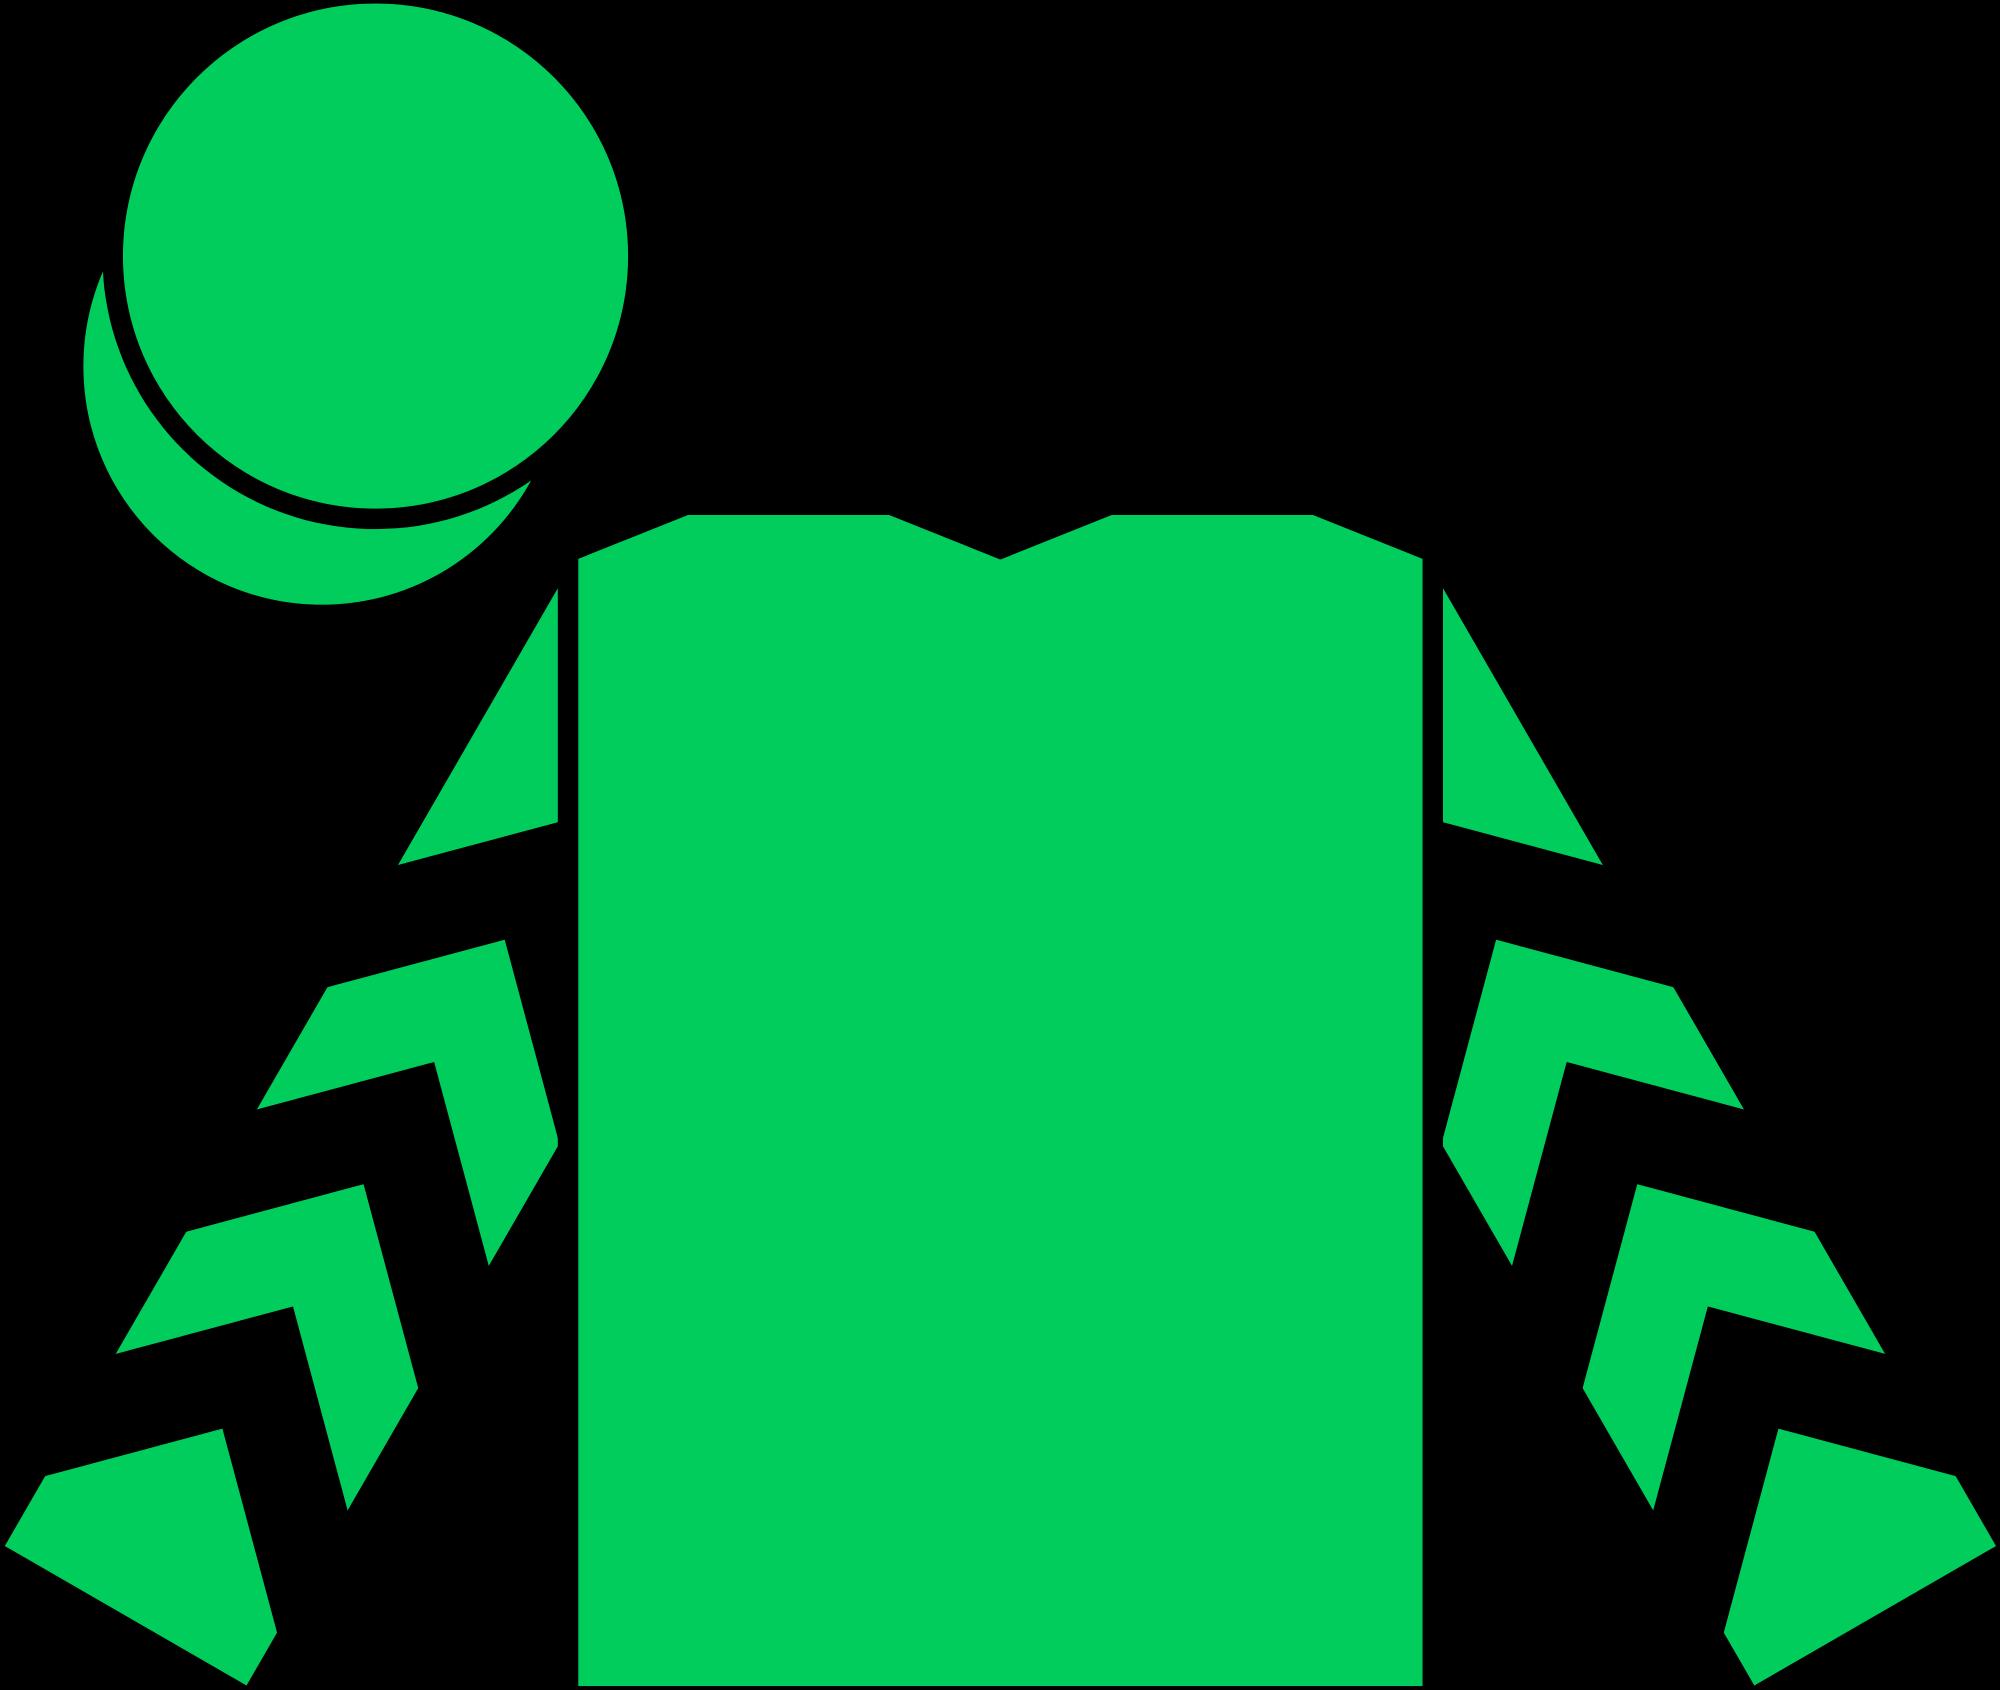 New approach wikipedia racing. Win clipart green curtain